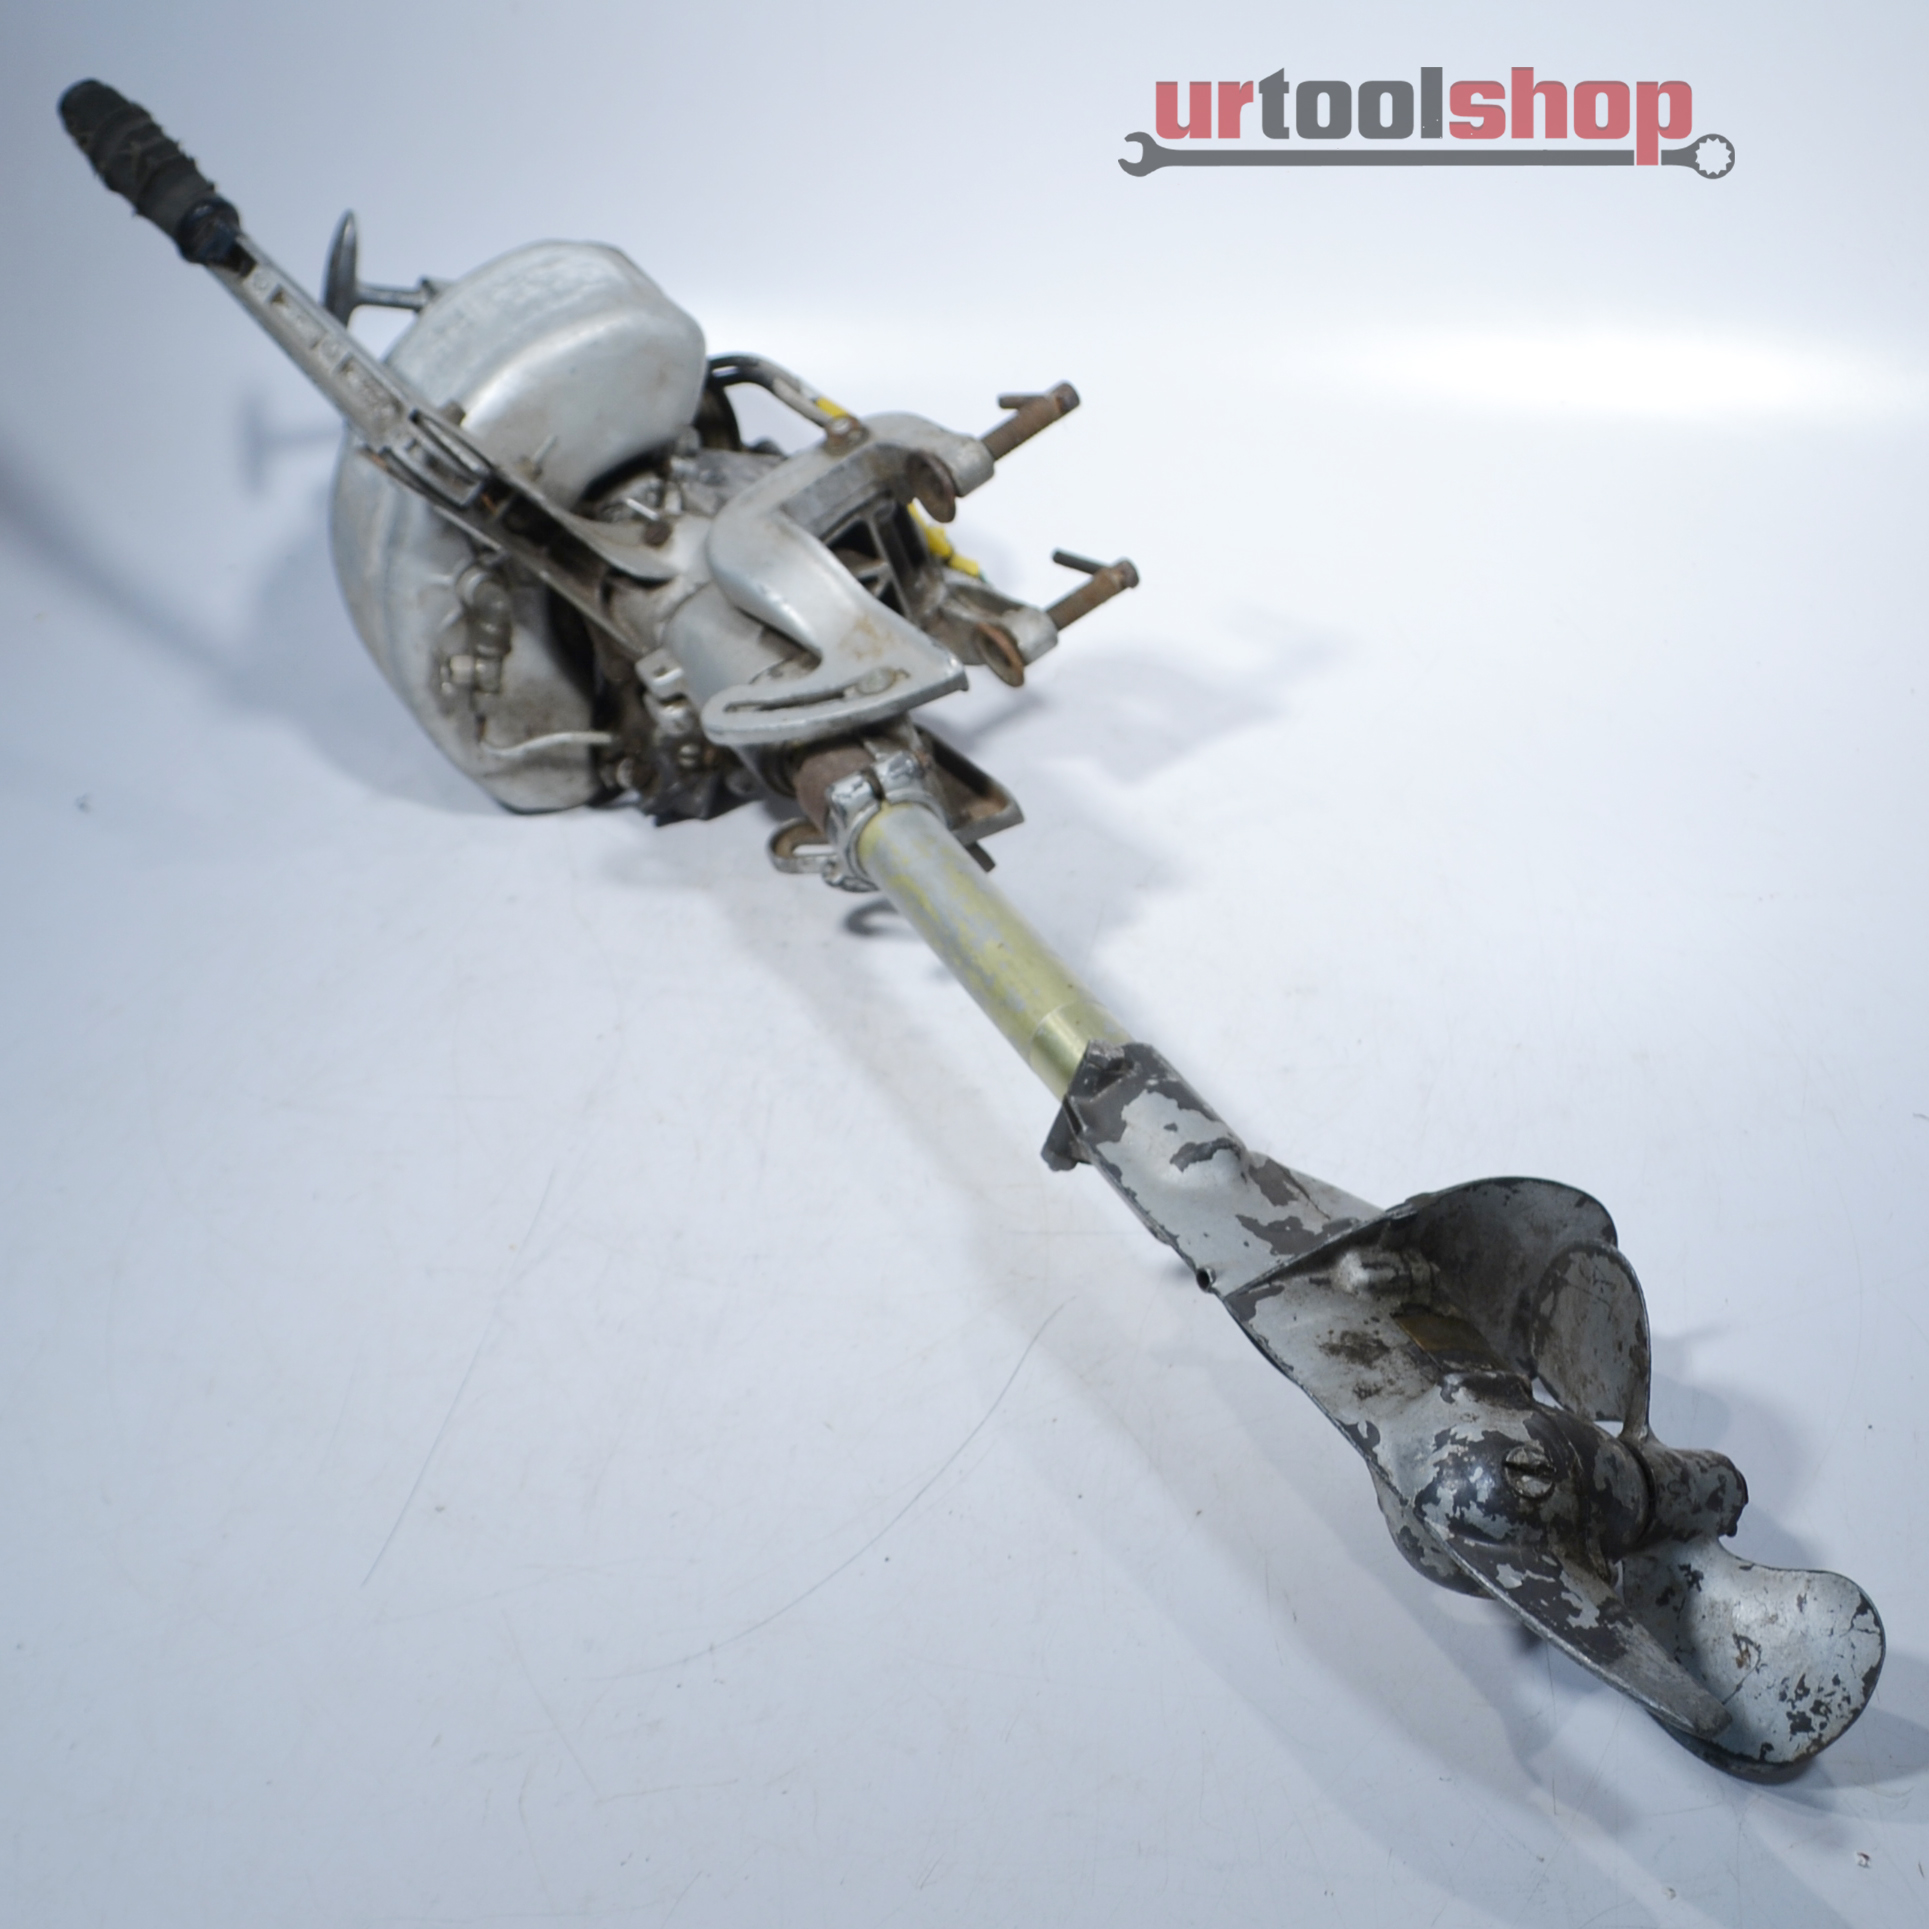 1940 2 5 hp antique johnson seahorse outboard motor model for Johnson 2 hp outboard motor for sale